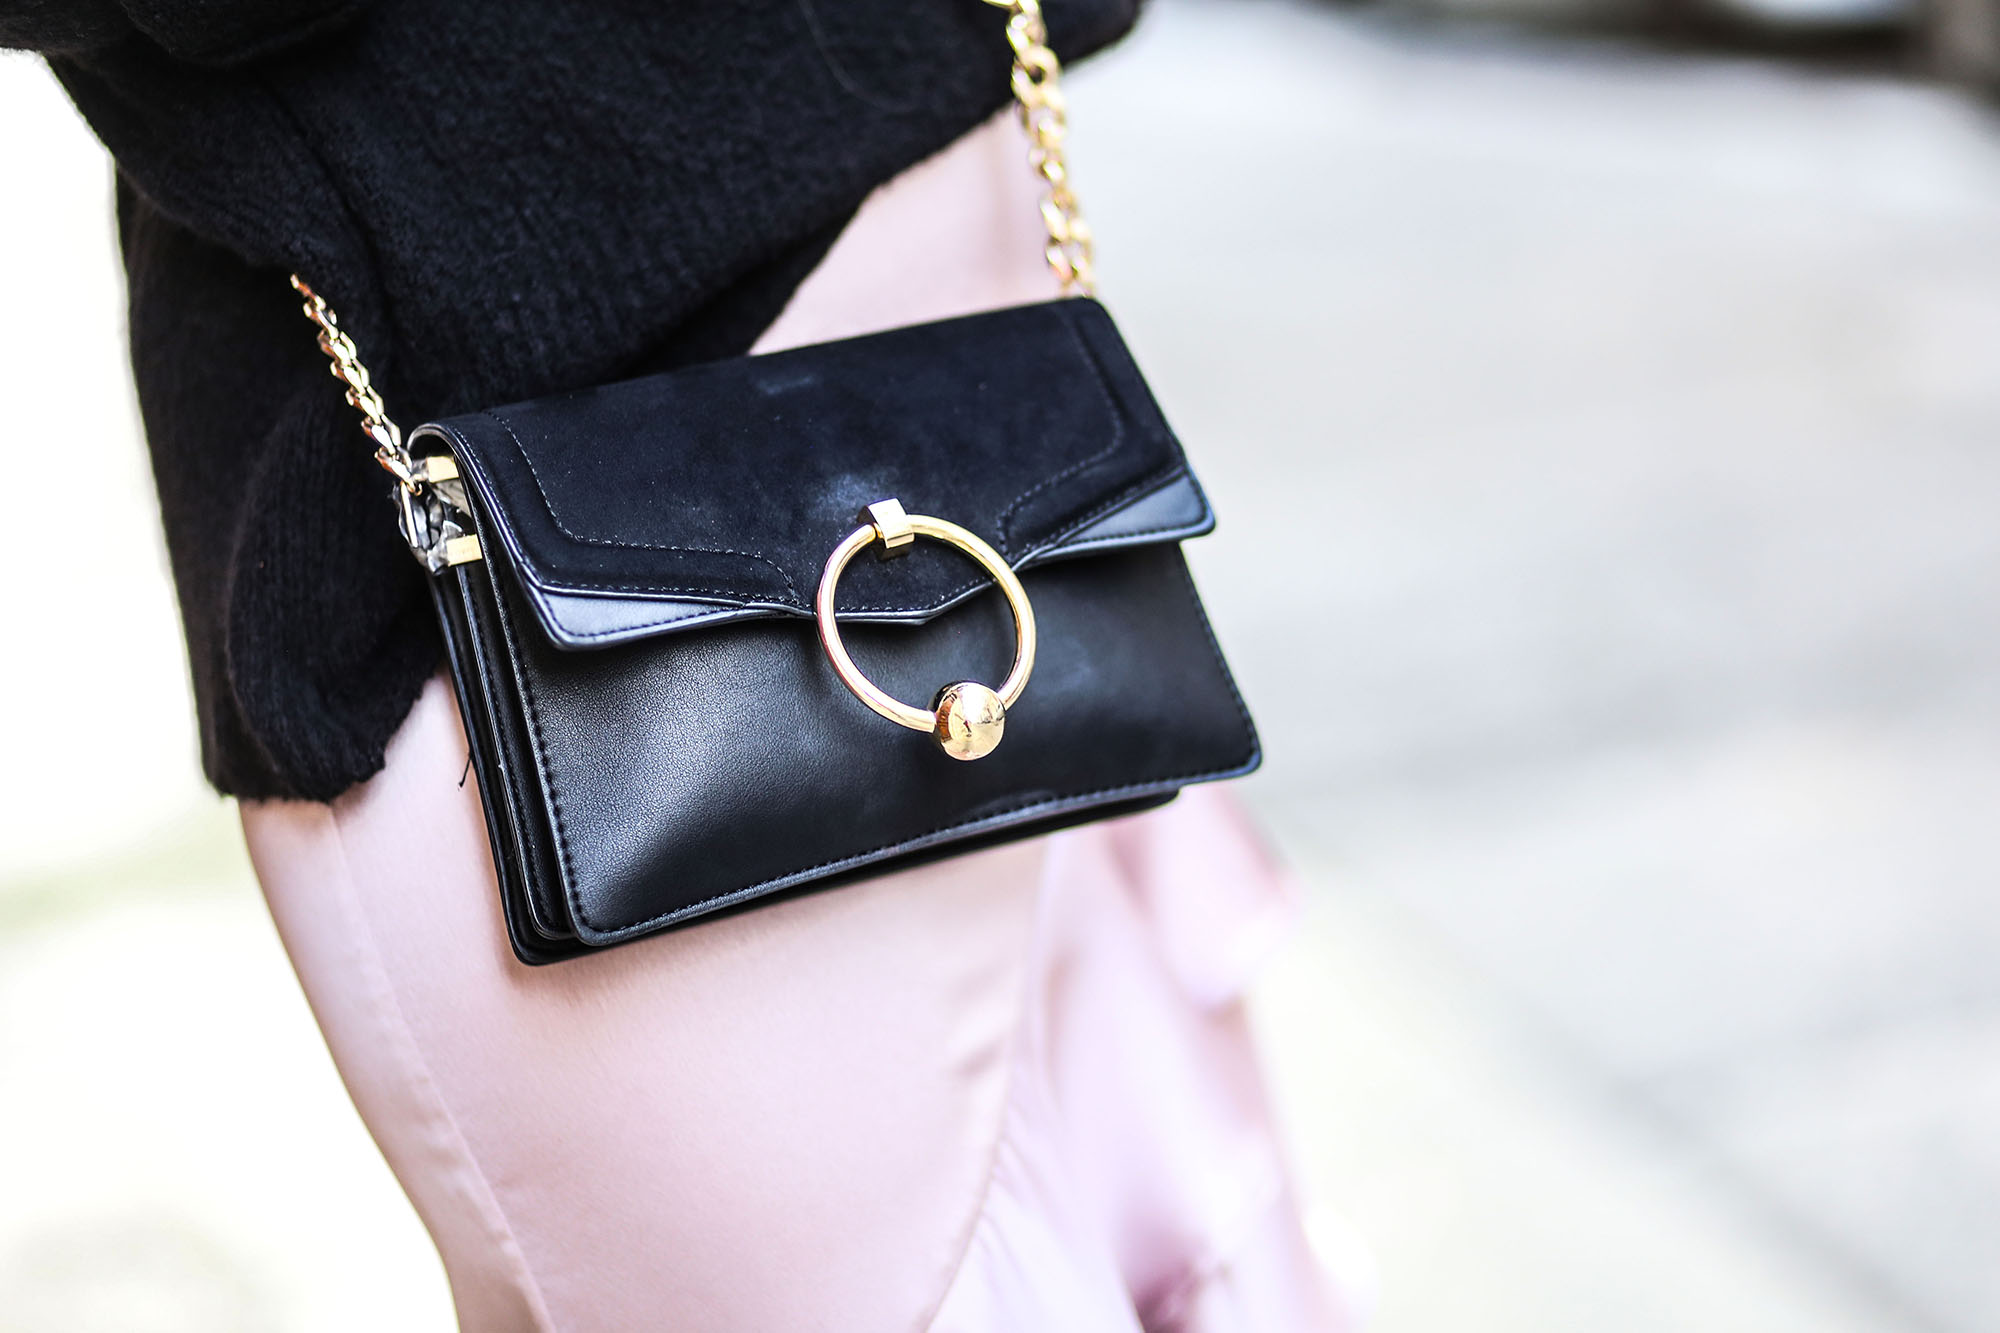 sac topshop noir